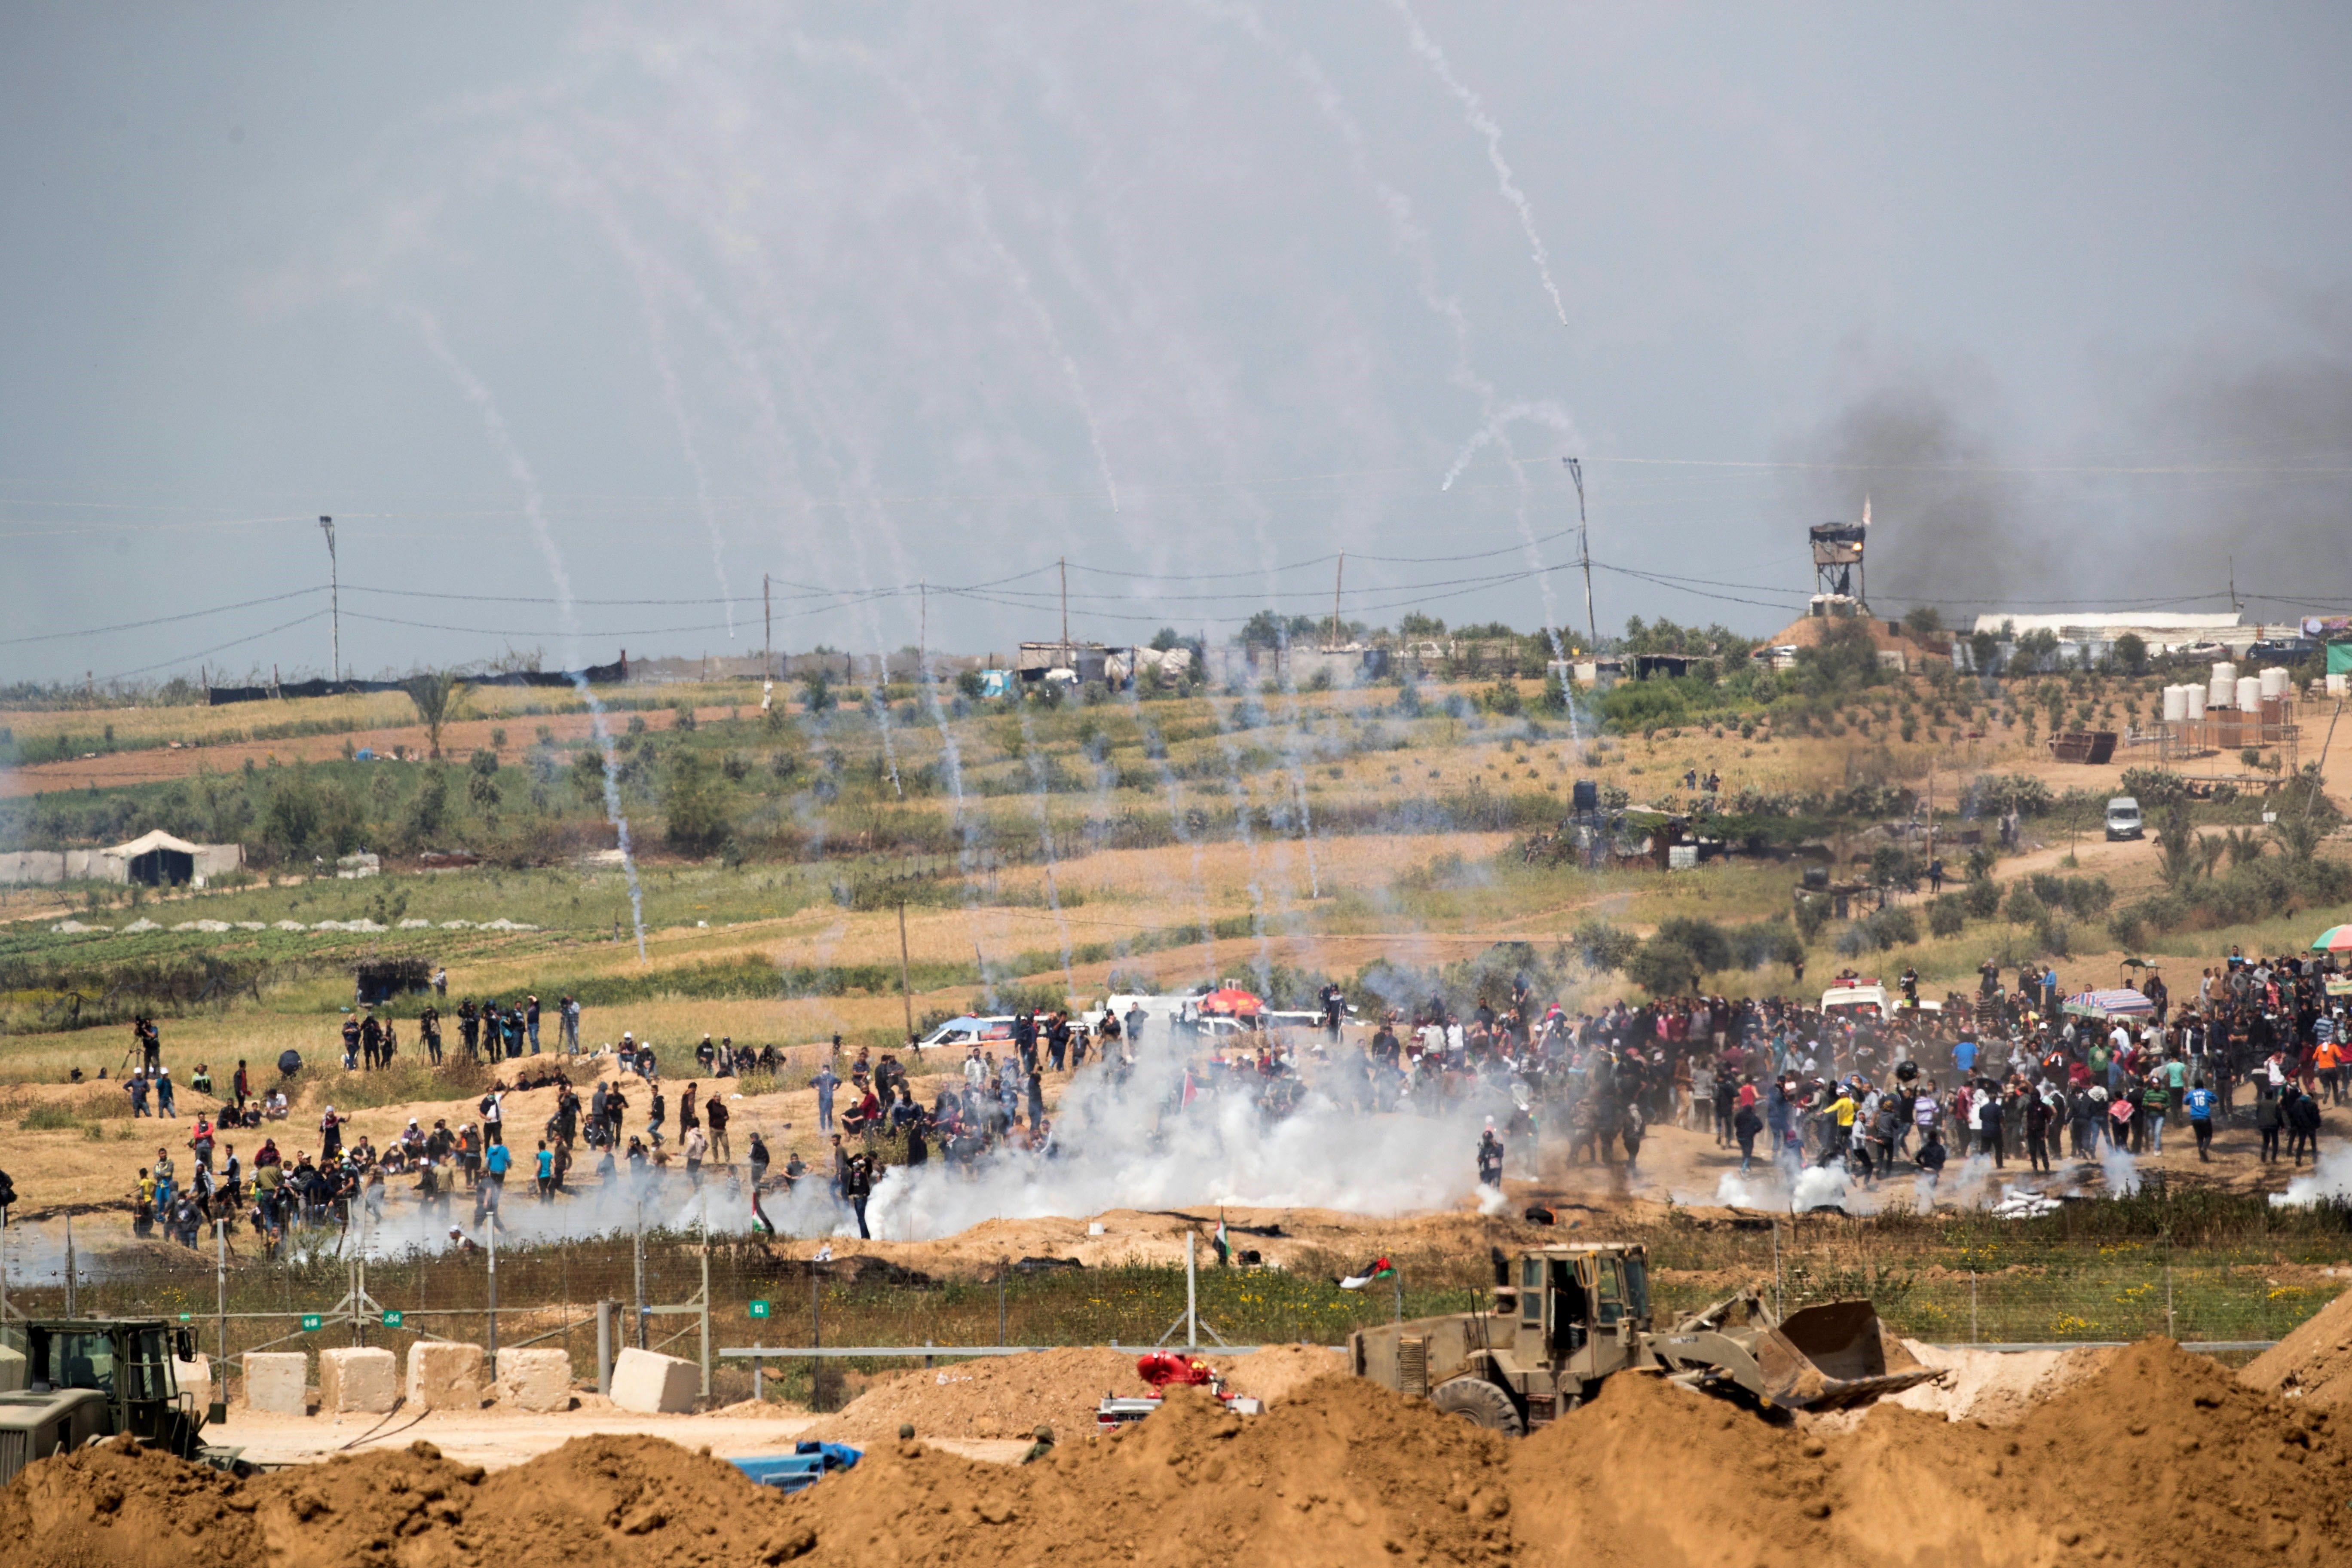 Joves palestins cremen rodes a la frontera entre Gaza i Israel. /ATEF SAFADI